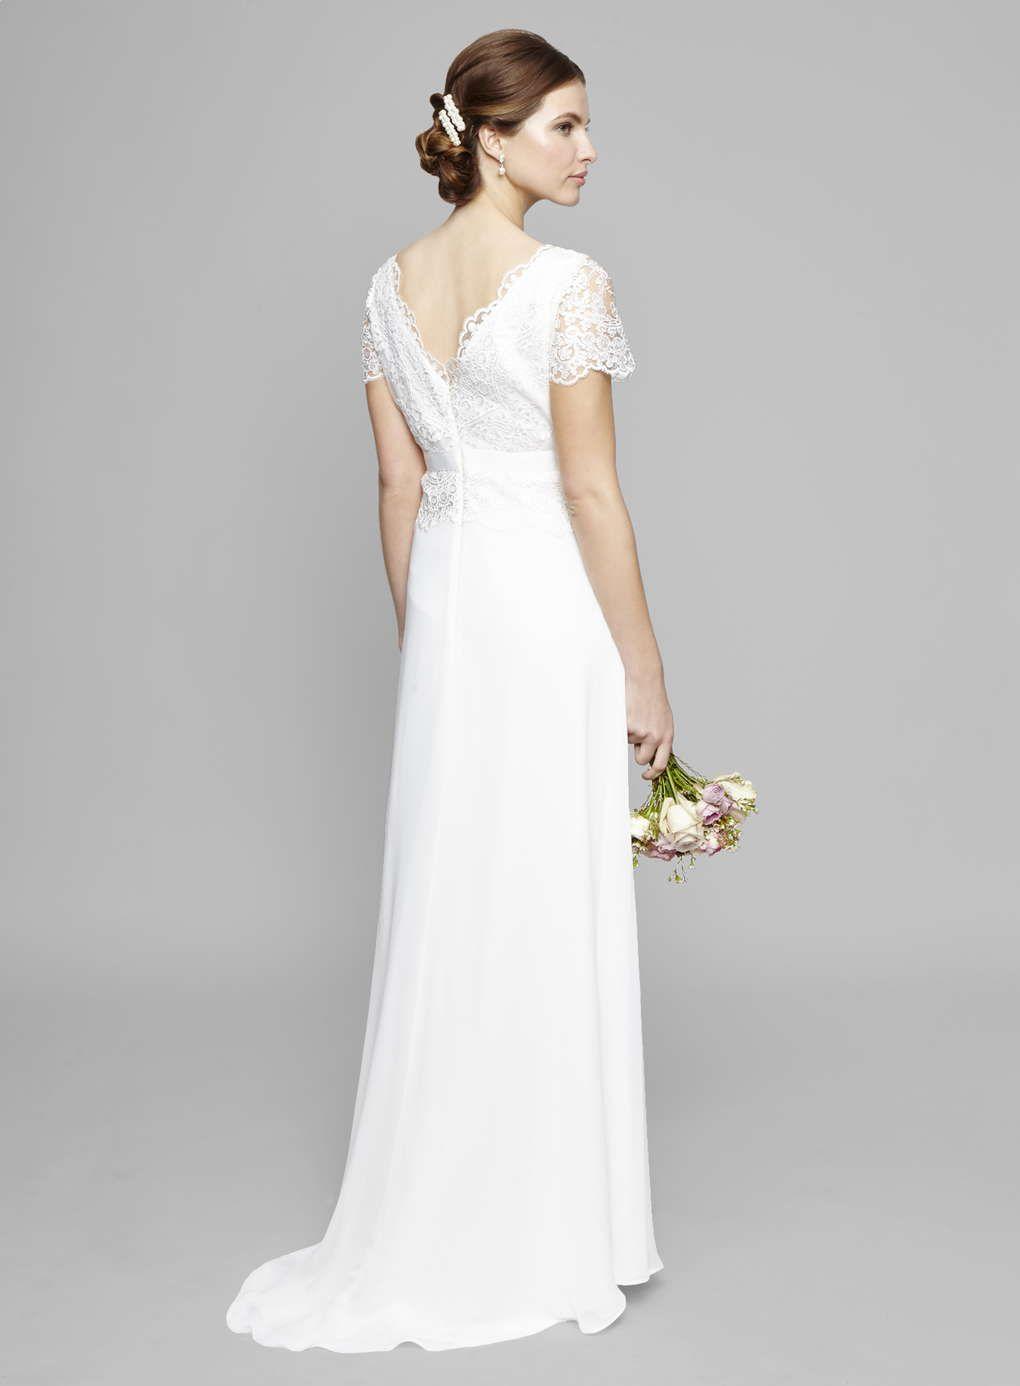 7ba4a7a6530 Ivory Willow Lace Peplum Wedding Dress